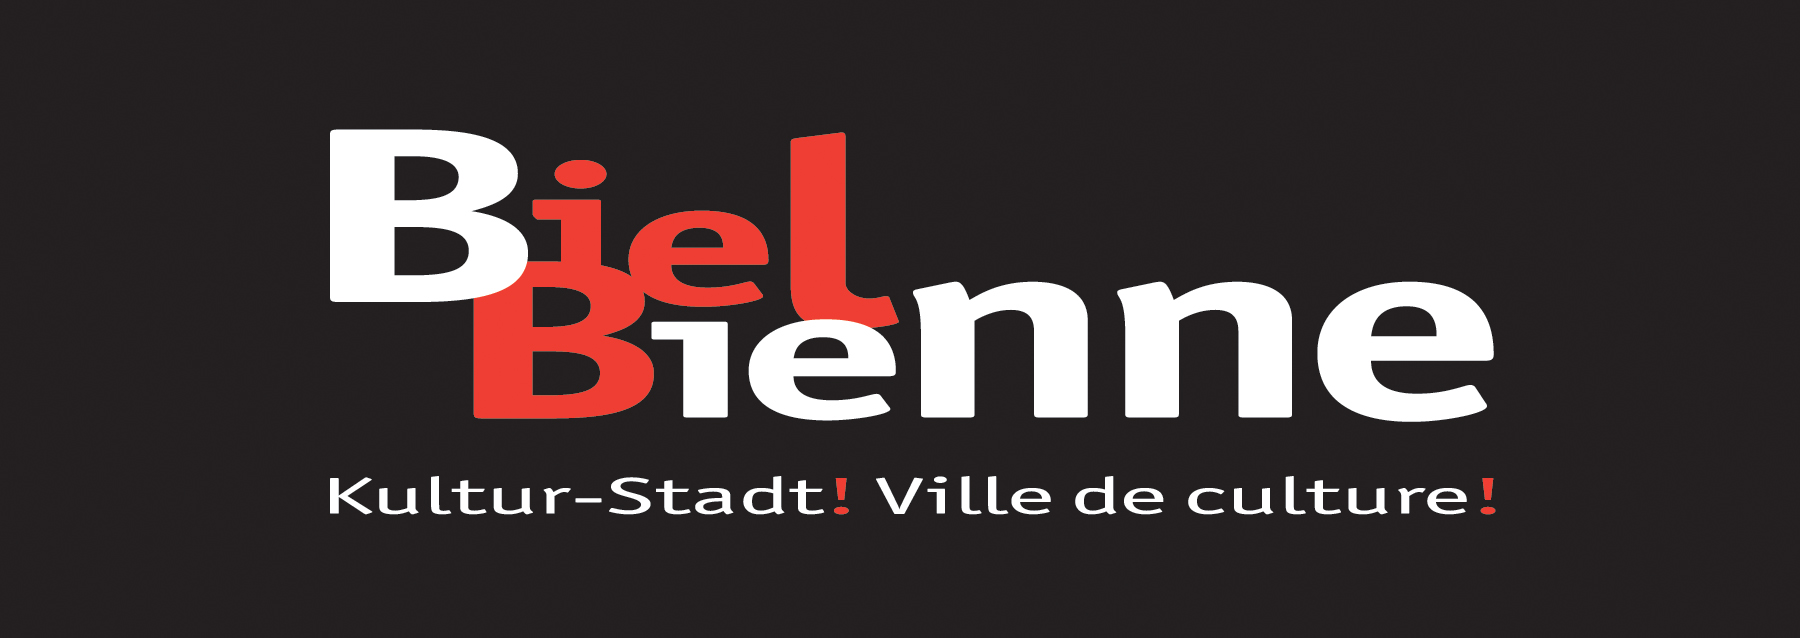 Logo BielBienne_SCREEN_Kultur_Culture_farbig_couleur.jpg